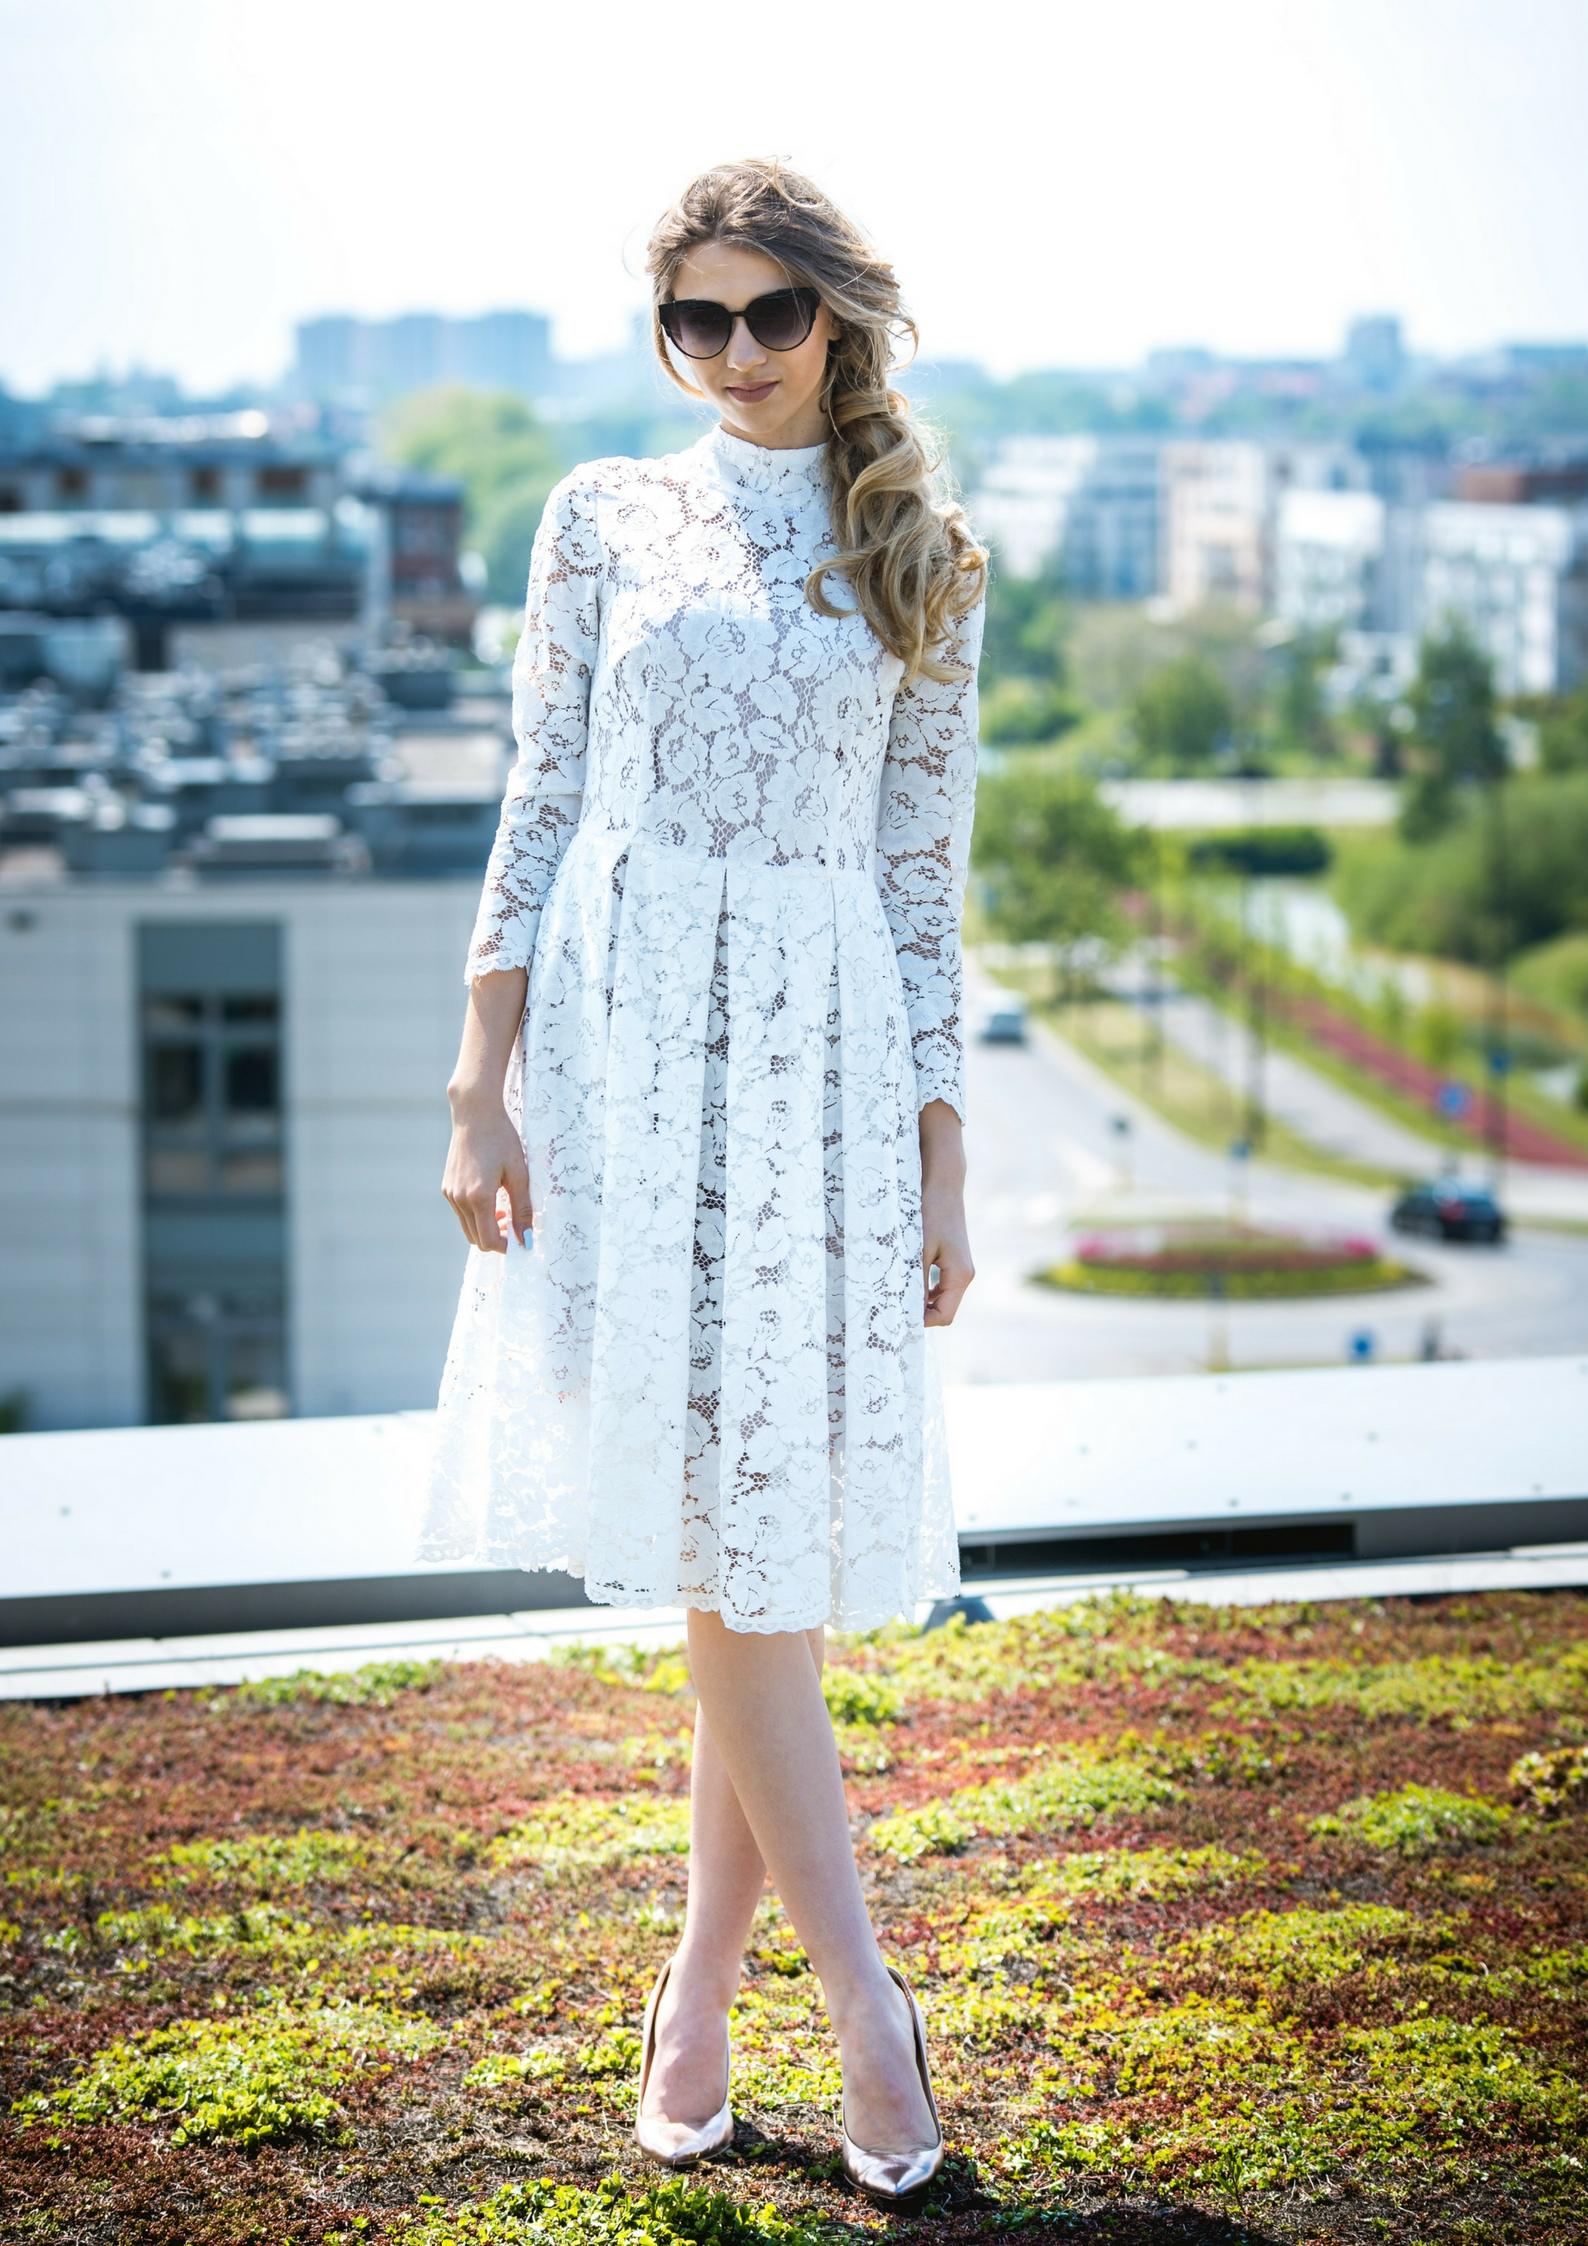 e5f60deab4 Biała koronkowa sukienka Kornelia by Swing SWING FASHION STORE